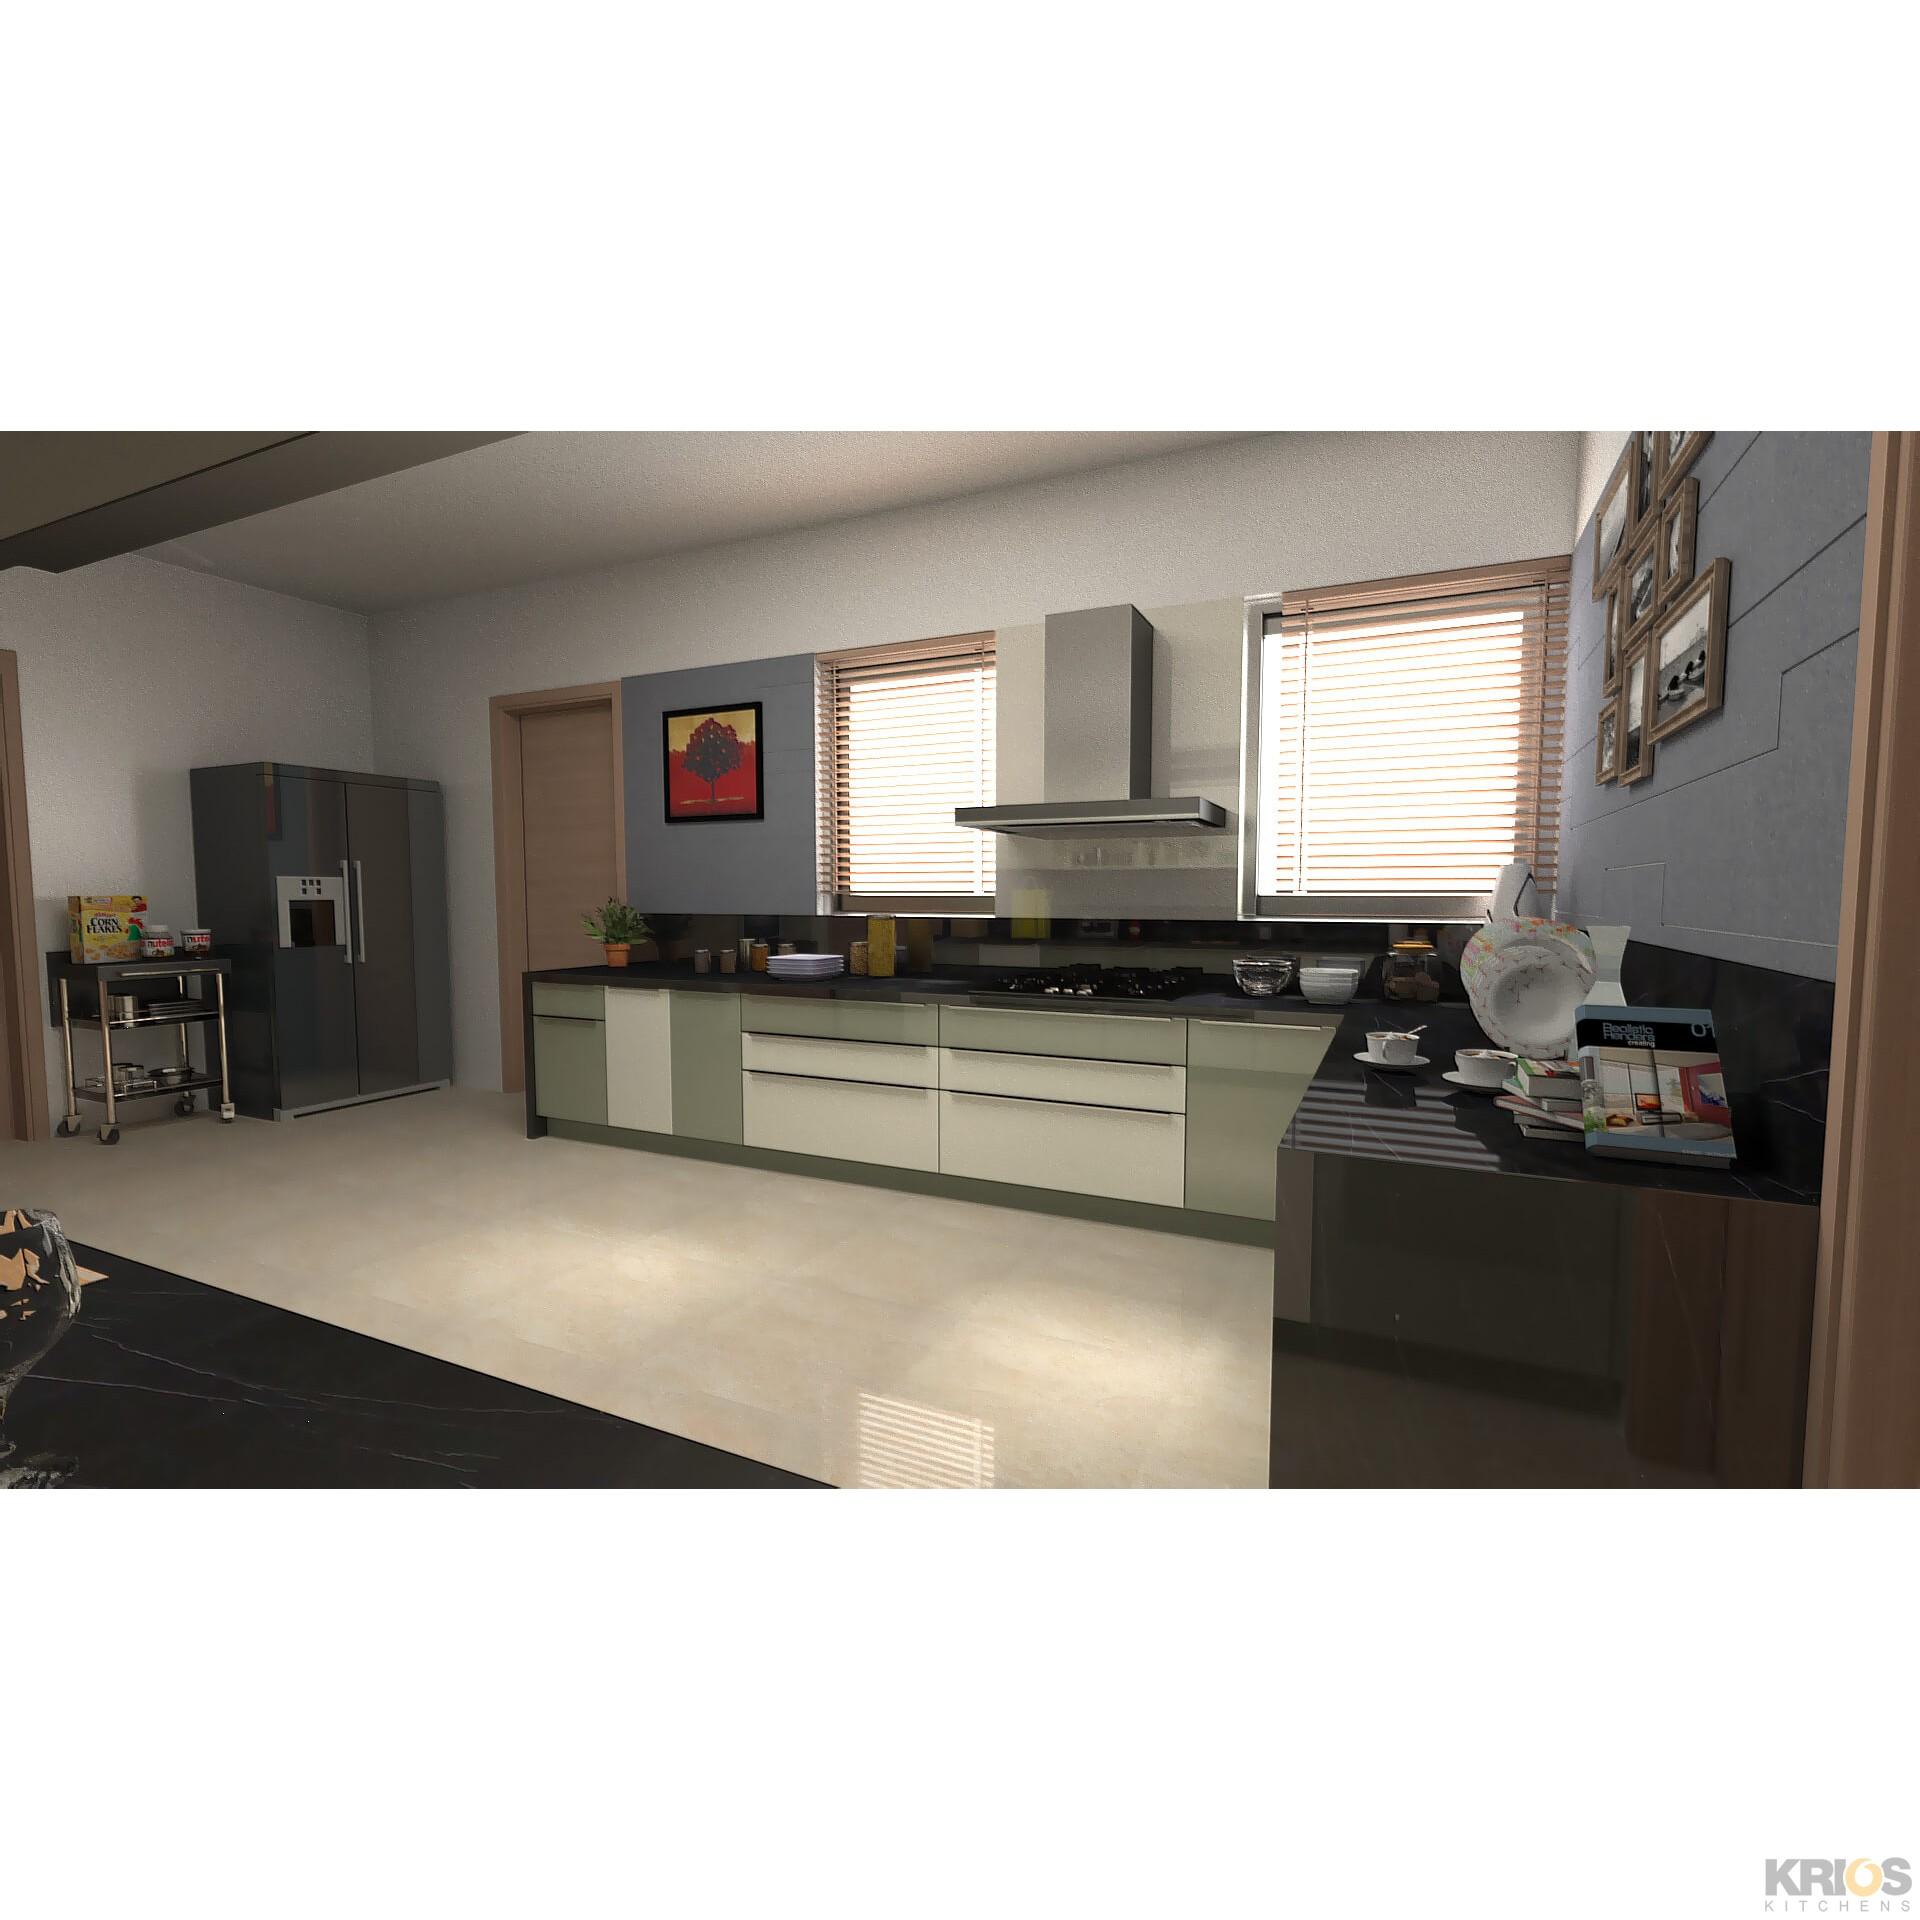 Green Modular Kitchen: Modular Kitchens